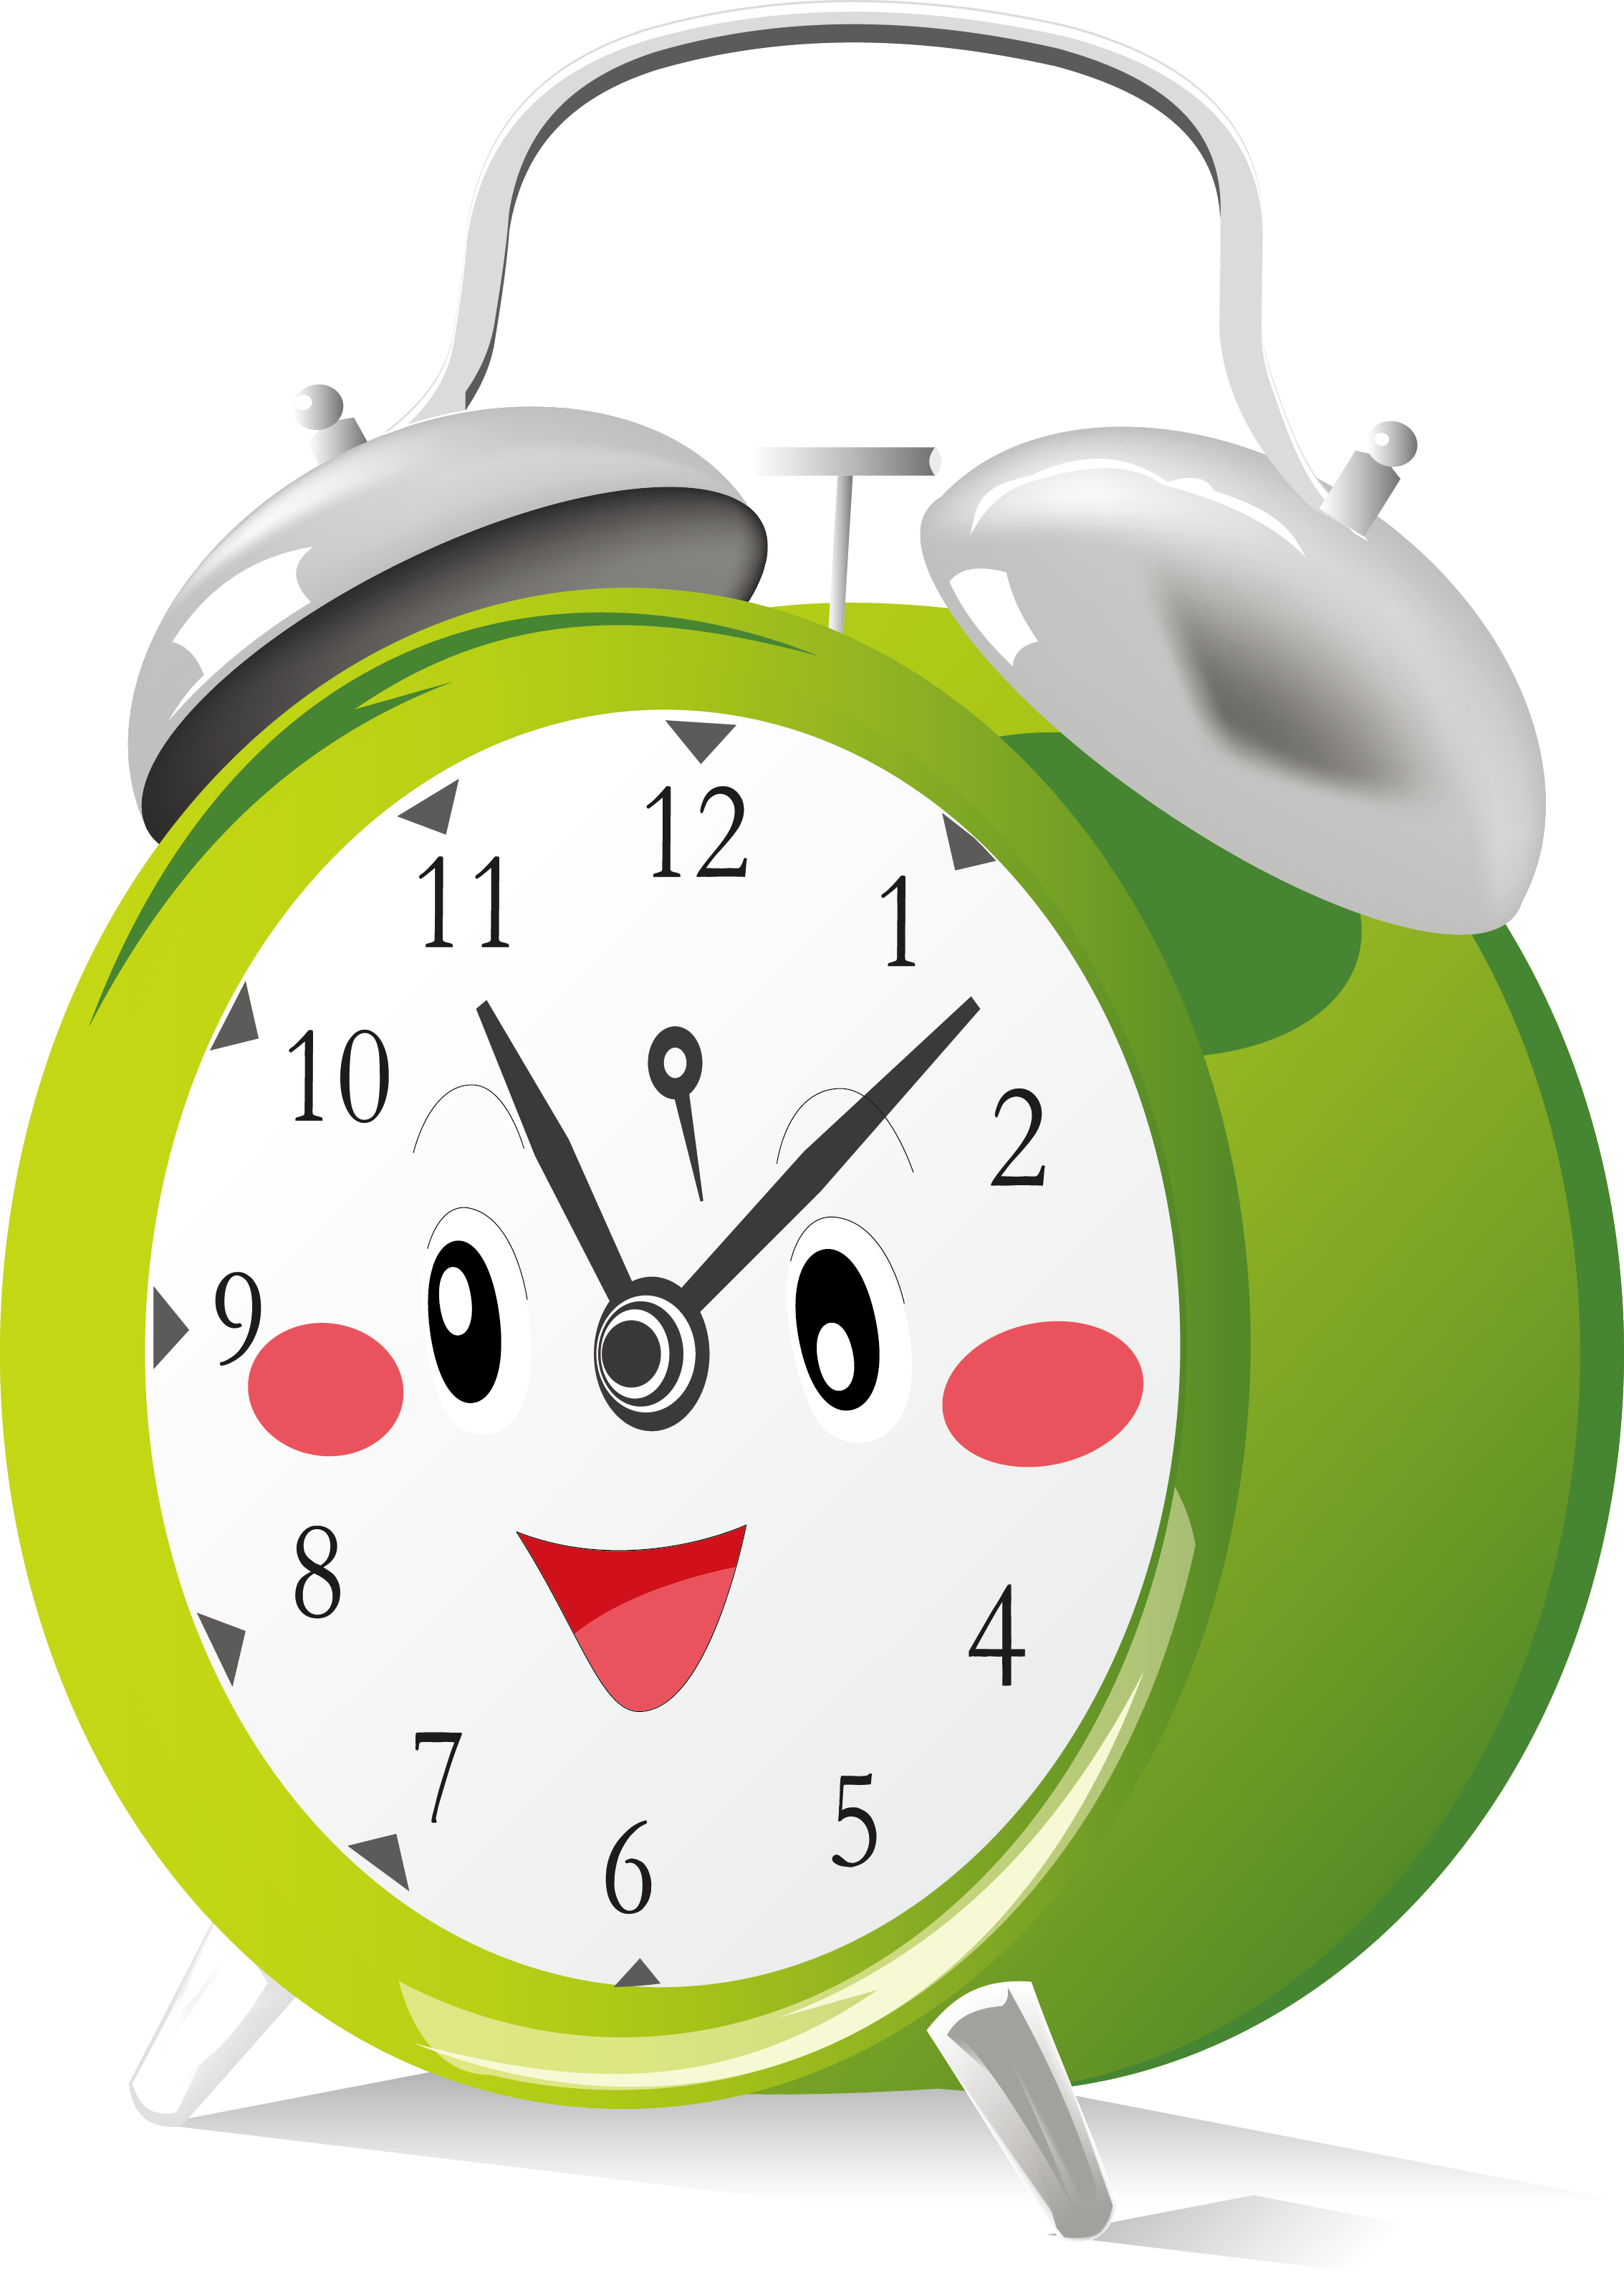 Mr Clock Is Friendly Clock Sort Of Like Tickety Tock Alarm Clock Clock Drawings Clock